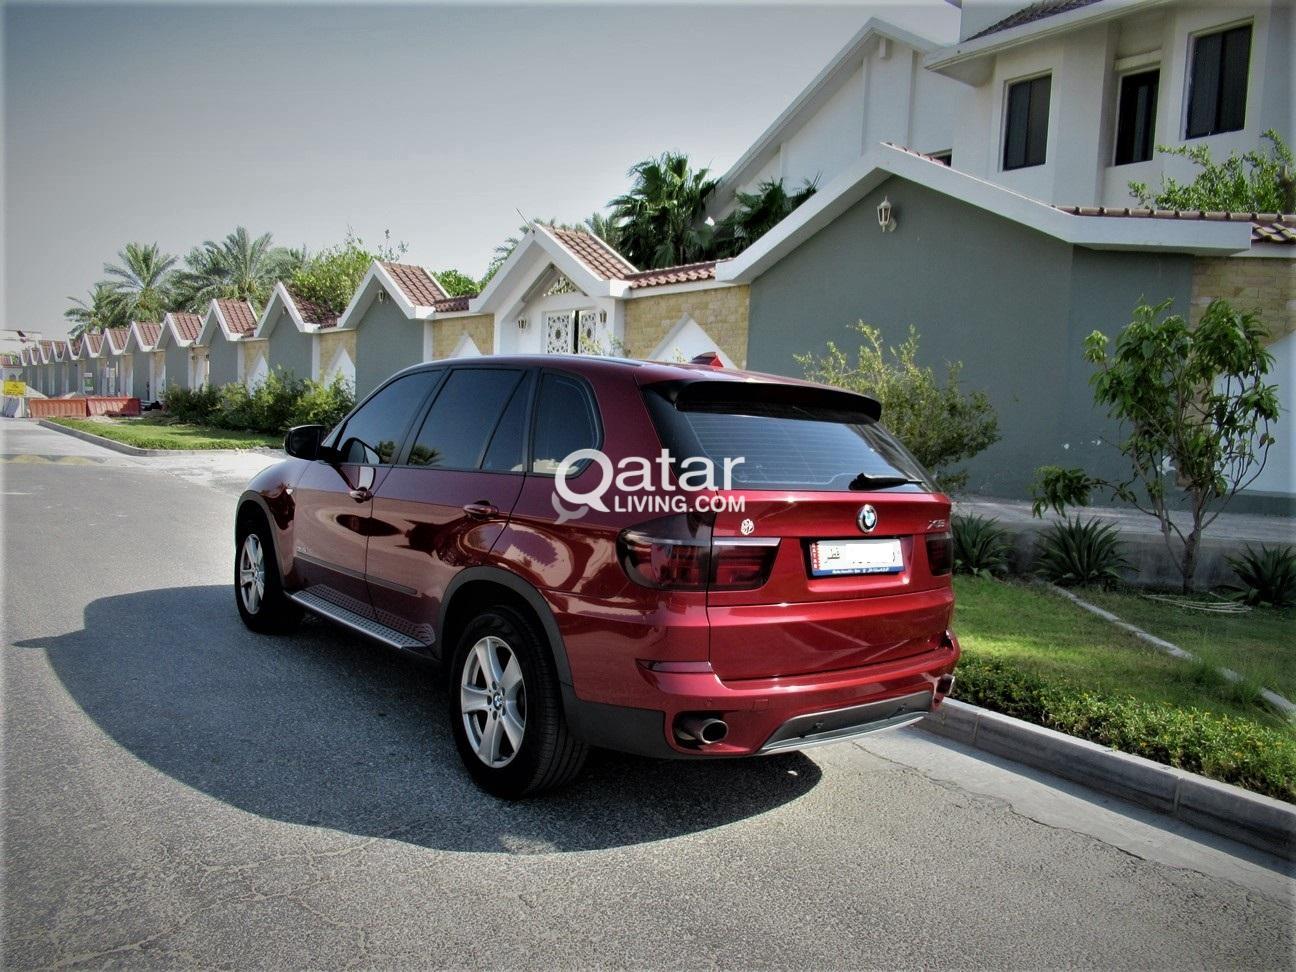 UNDER WARRANTY BMW X5 MODEL 2012 FULL OPTION